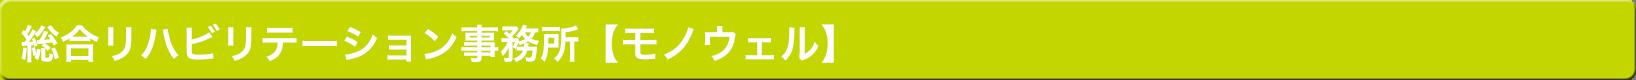 h3_総合リハビリテーション事務所【モノウェル】